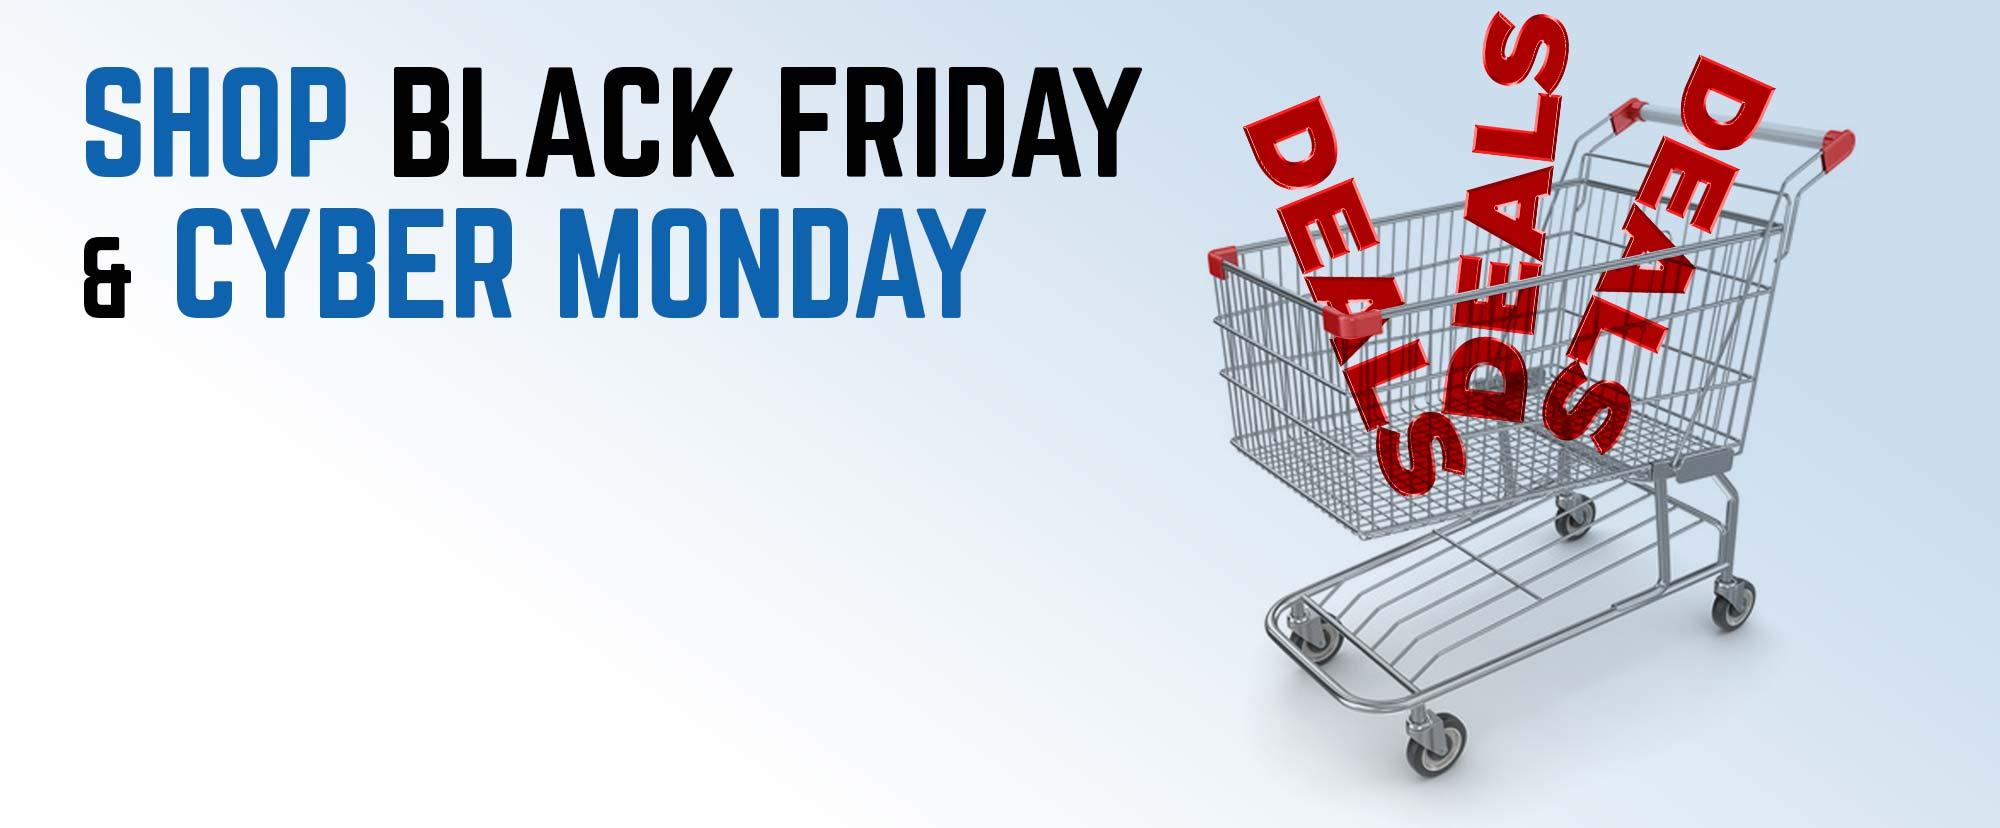 shop-black-friday-cyber-monday